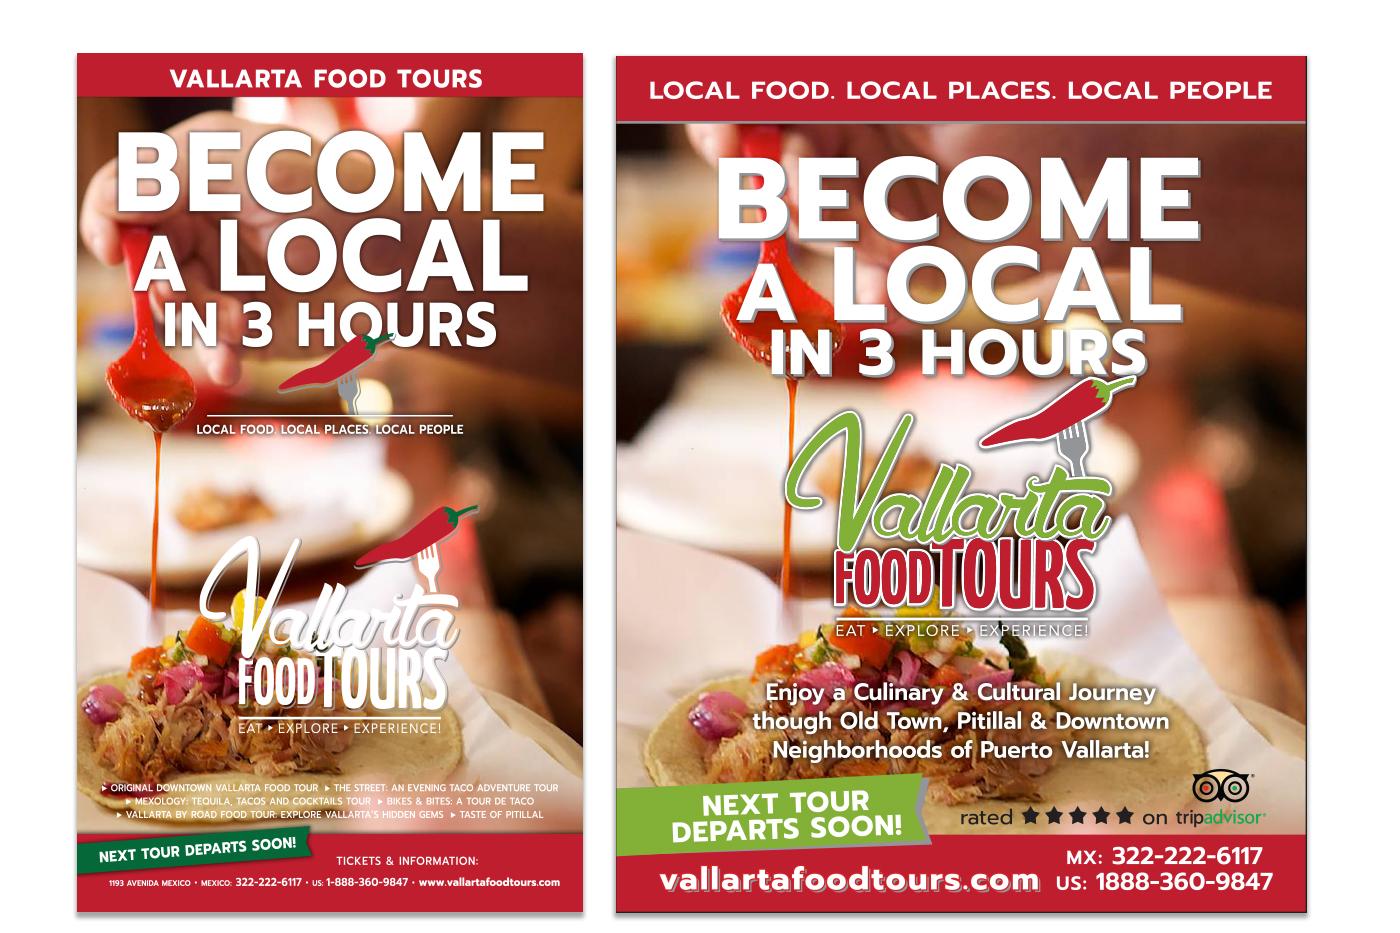 Vallarta-food-tour-poster-design-branding.jpg